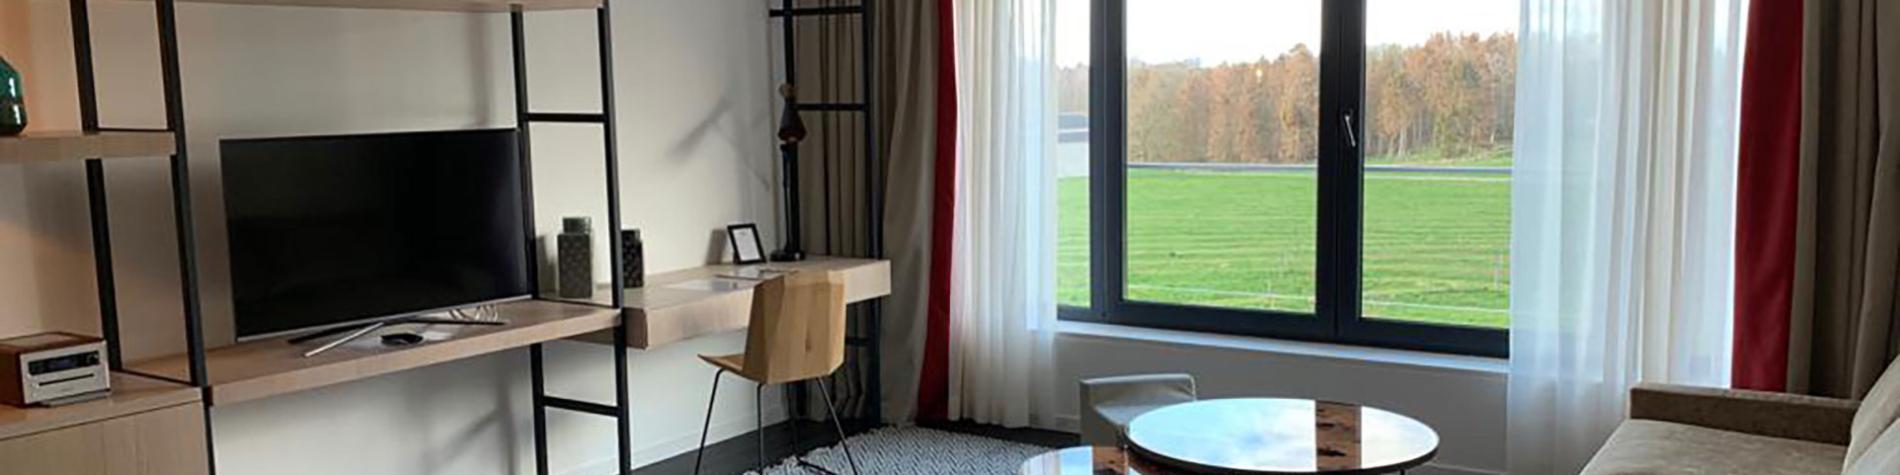 OFF Meeting - centre - séminaire - atypique - Brabant Wallon - Chambre Deluxe